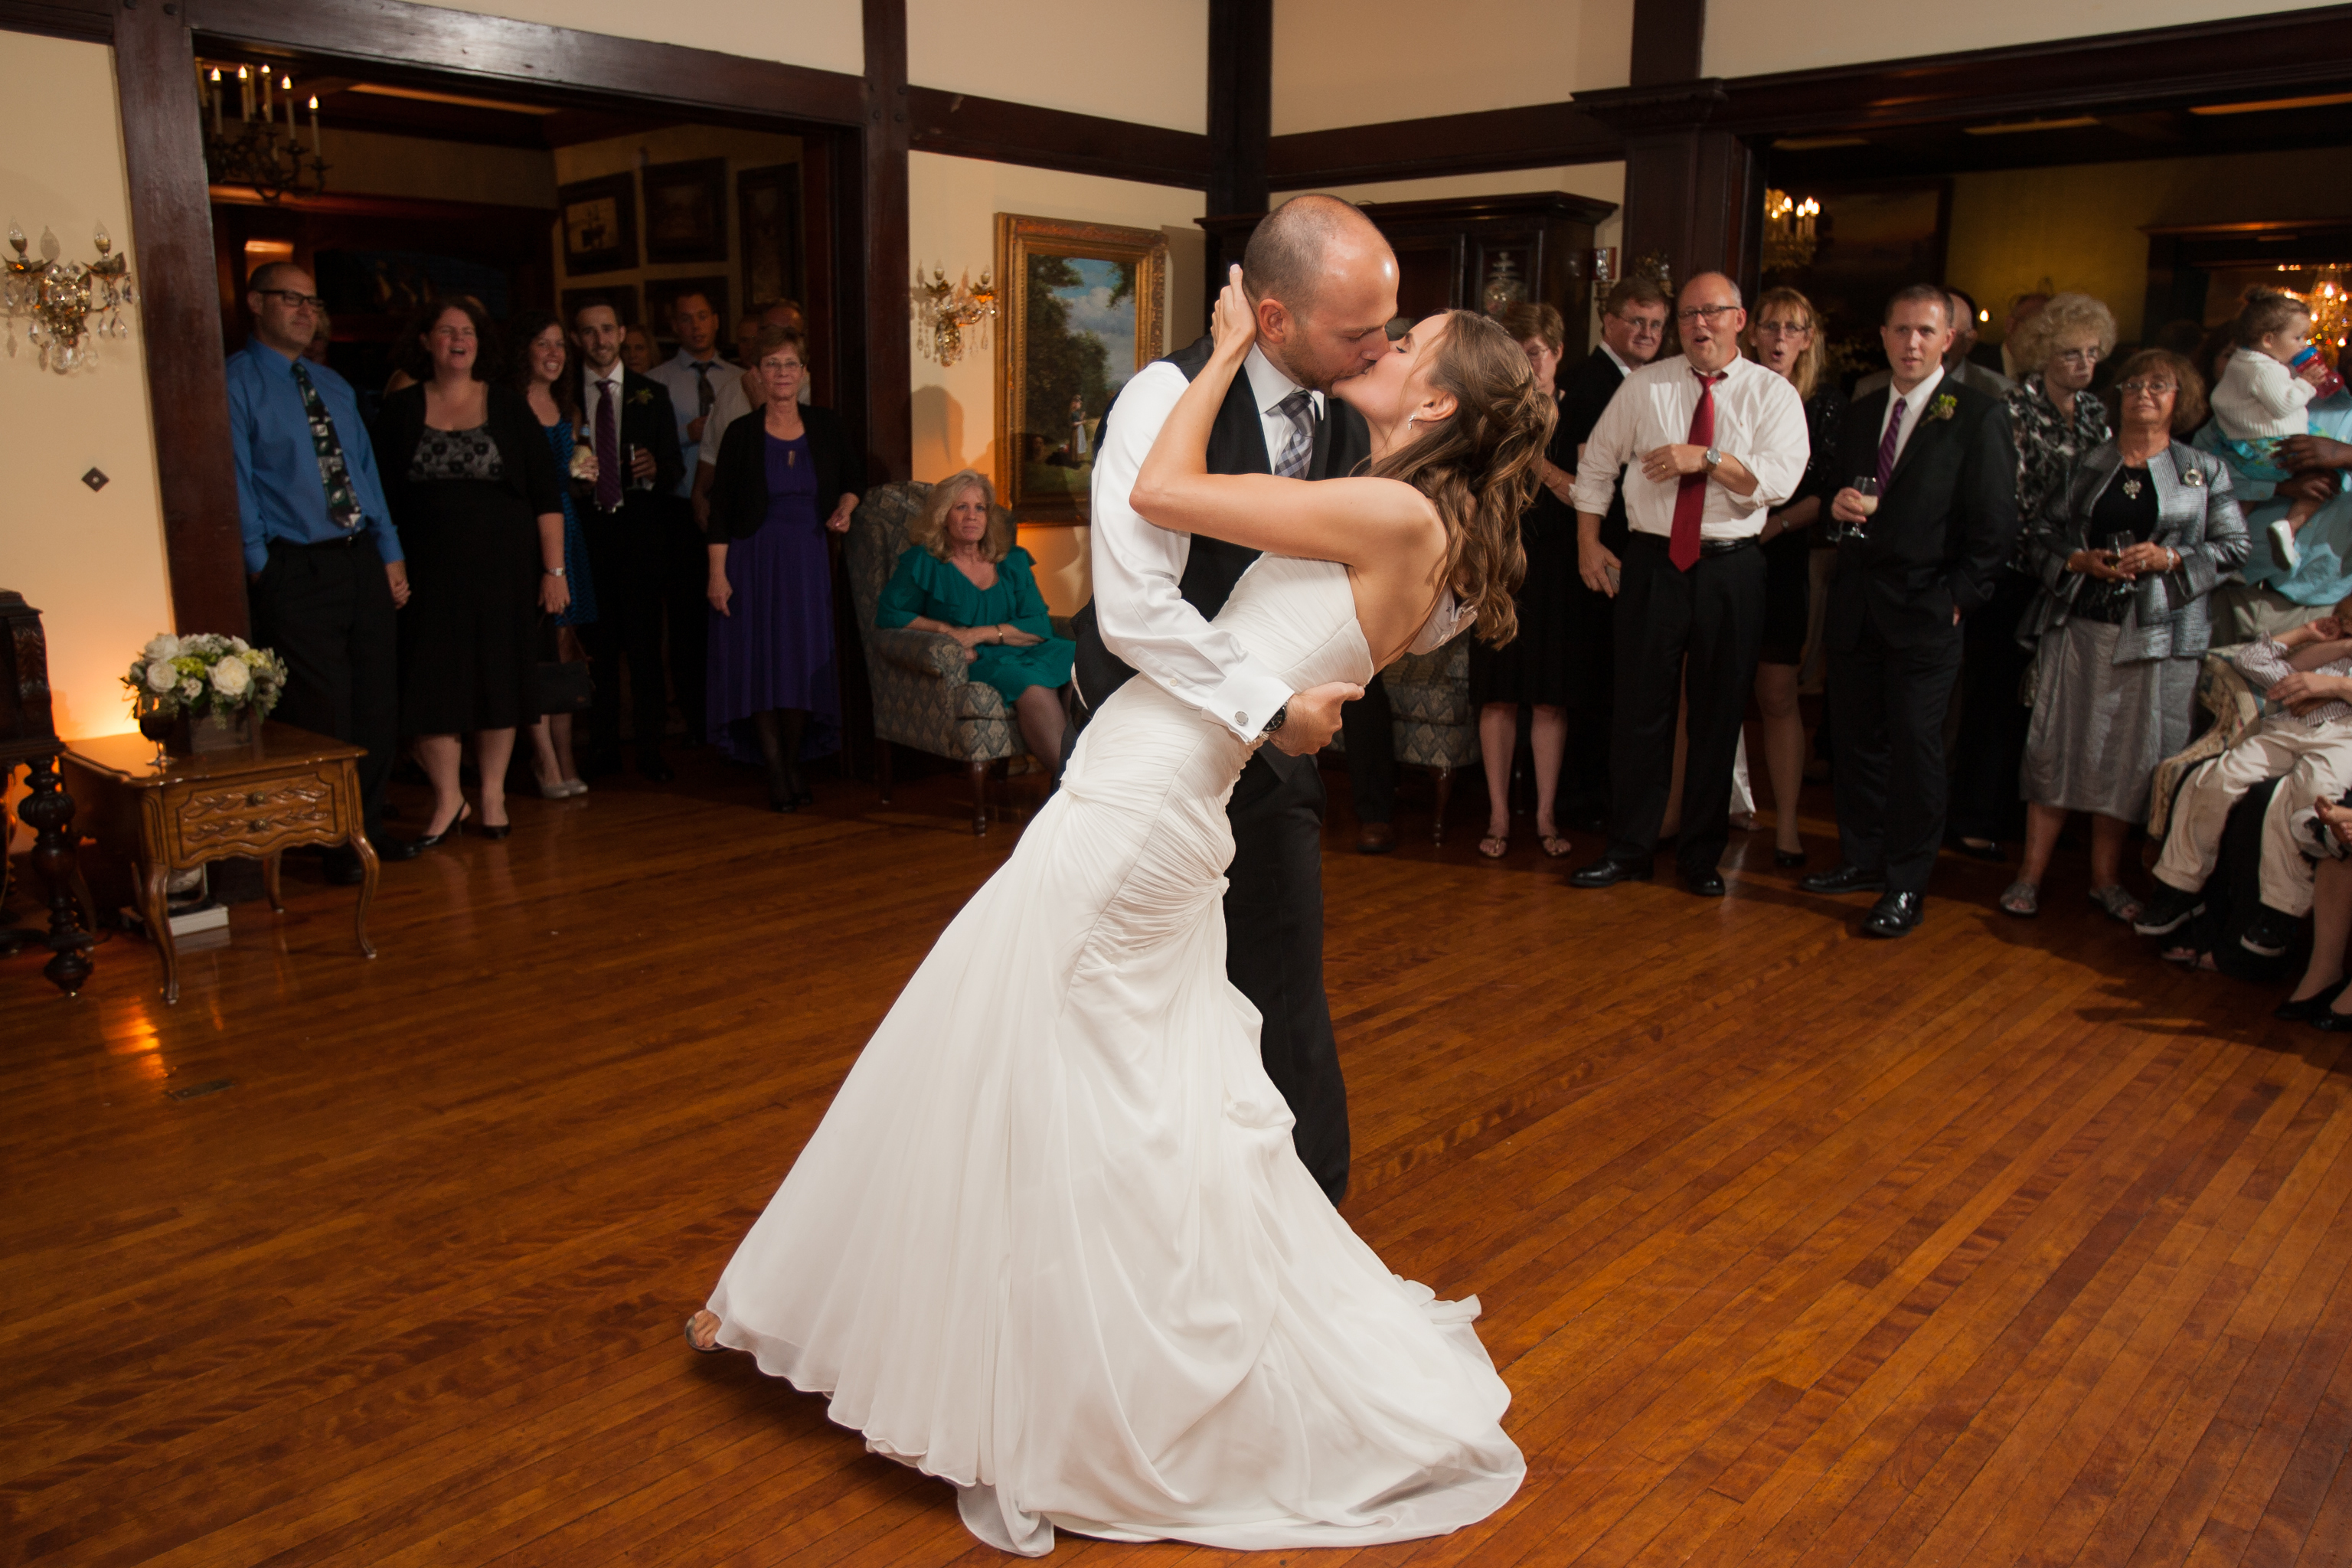 Gramercy Mansion Bed & Breakfast & Conference Center Wedding Venue ...